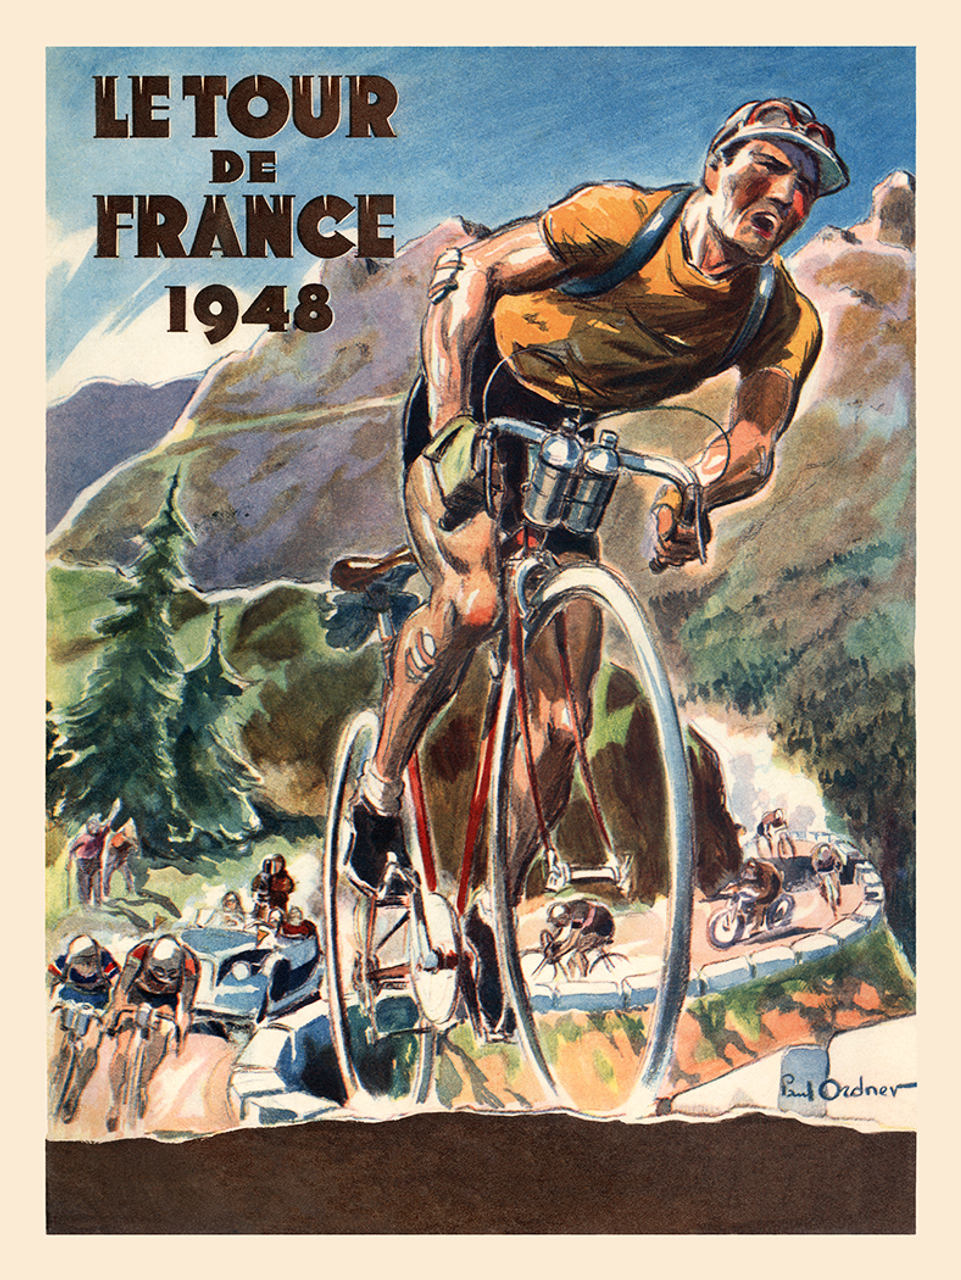 1948 Le Tour De France Bicycle Poster by Paul Ordner